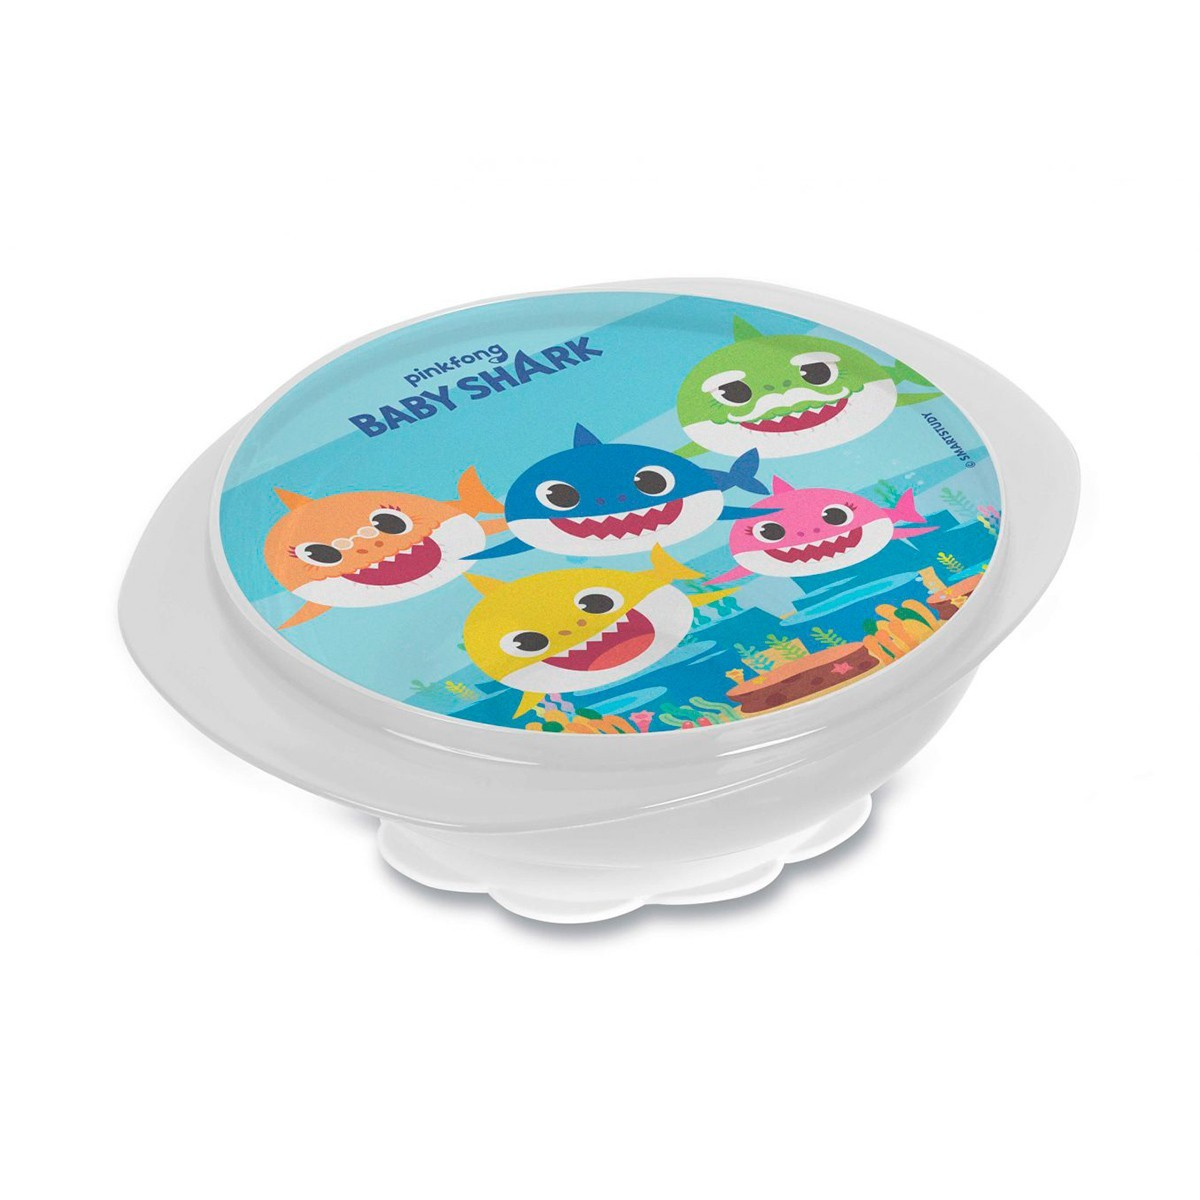 Prato C/ Ventosa + Tampa Decorada Baby Shark BabyGo Premium